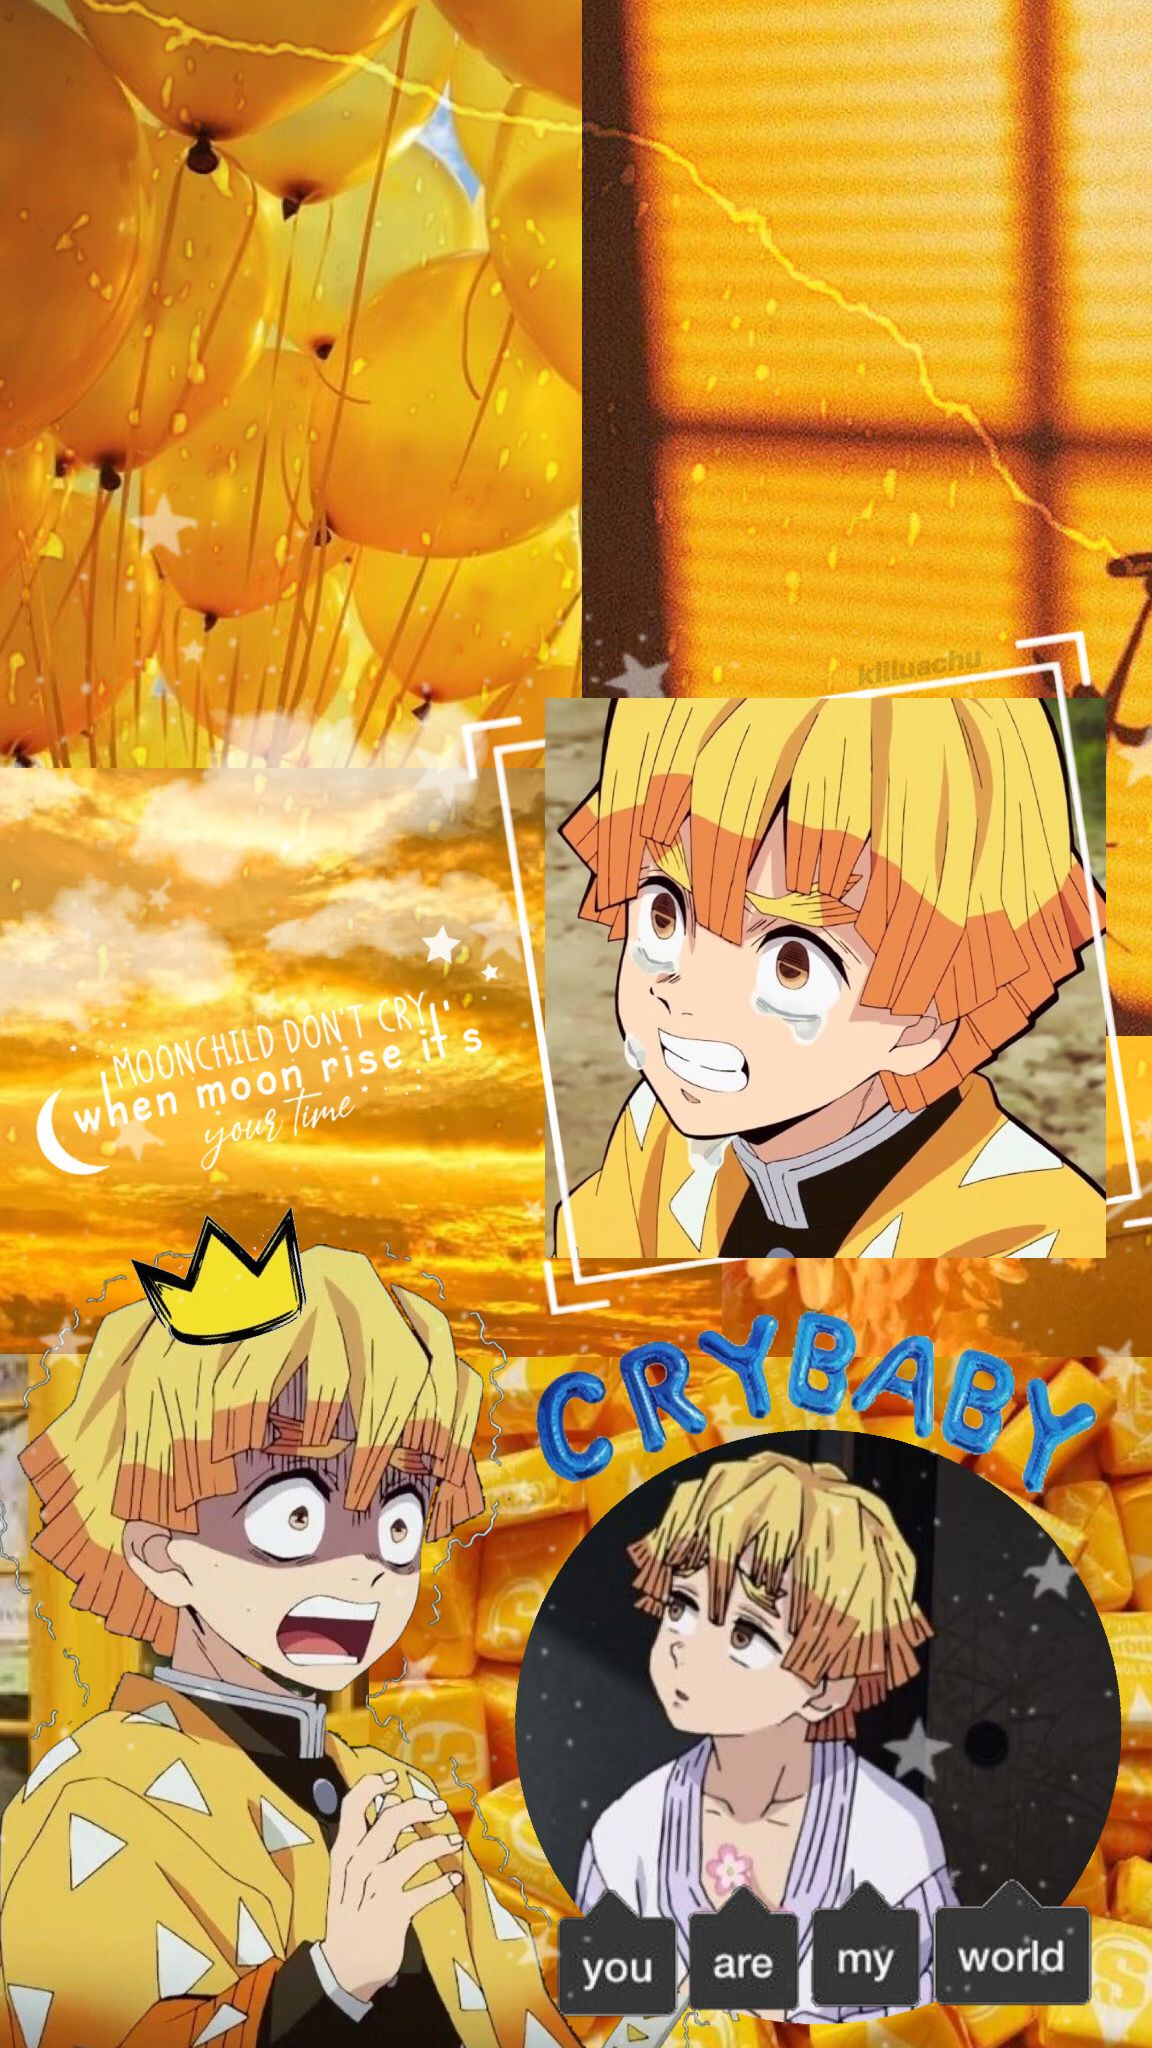 Zenitsu Agatsuma Lockscreen Wallpaper Anime Wallpaper Iphone Anime Naruto Wallpaper